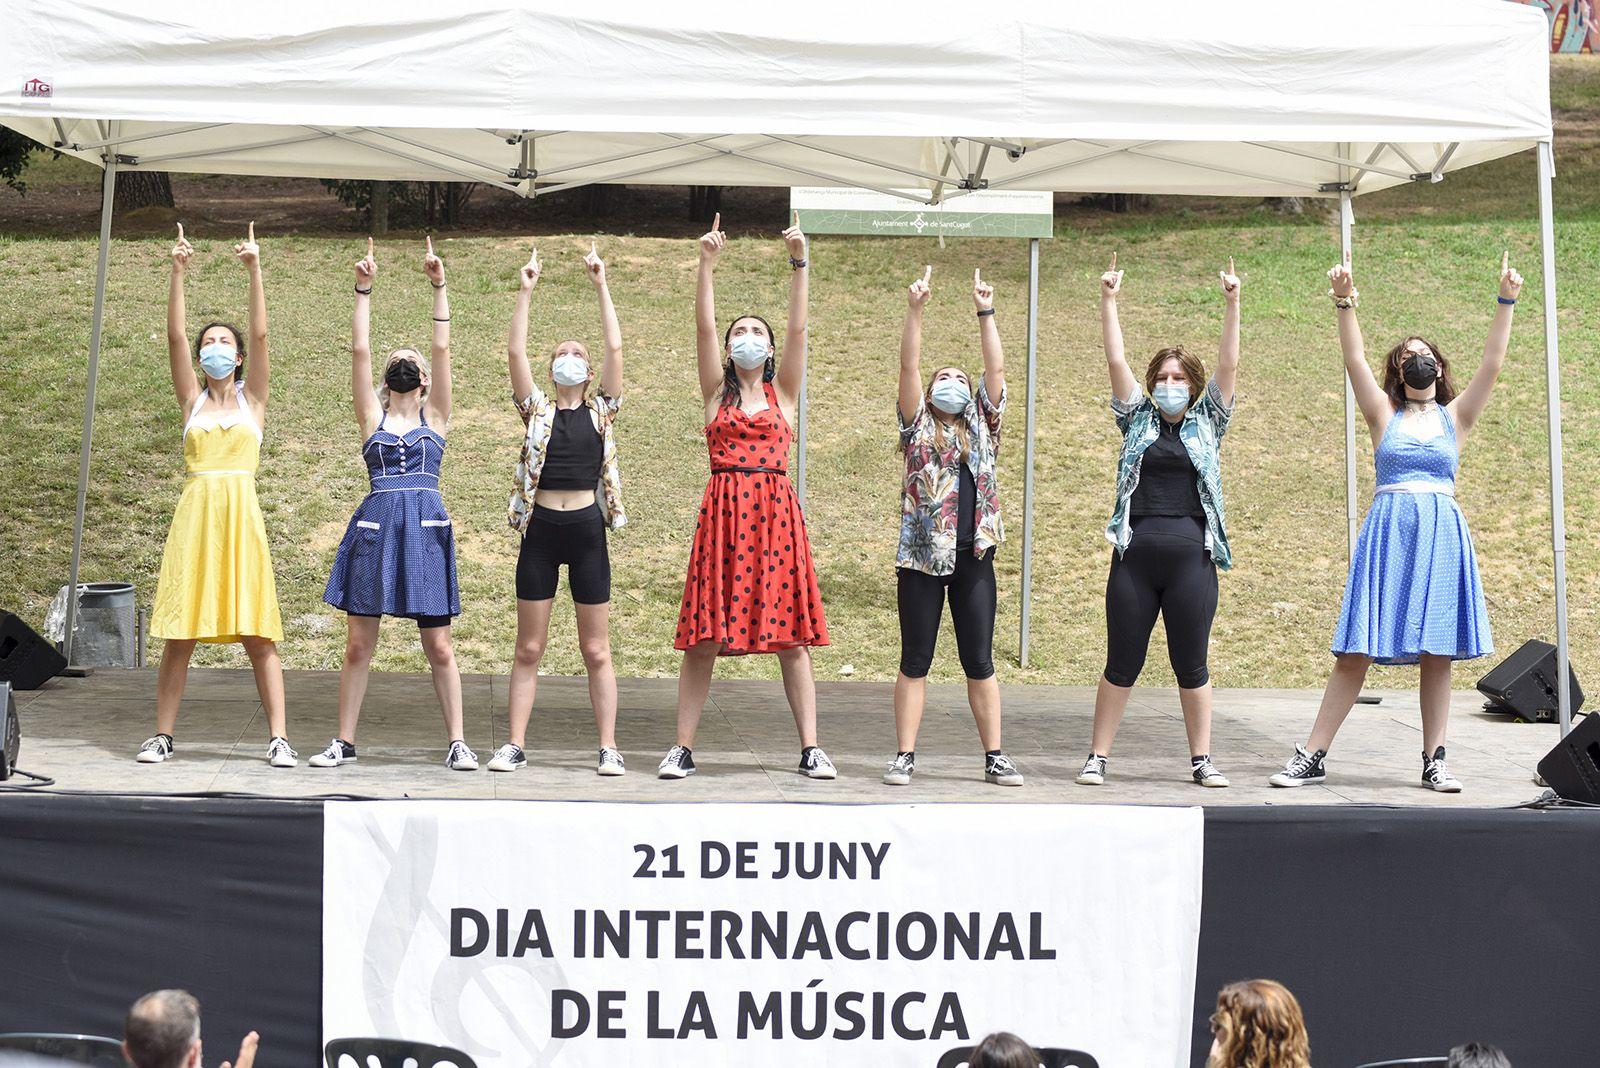 Teatre Musical Aula de So. Foto: Bernat Millet.